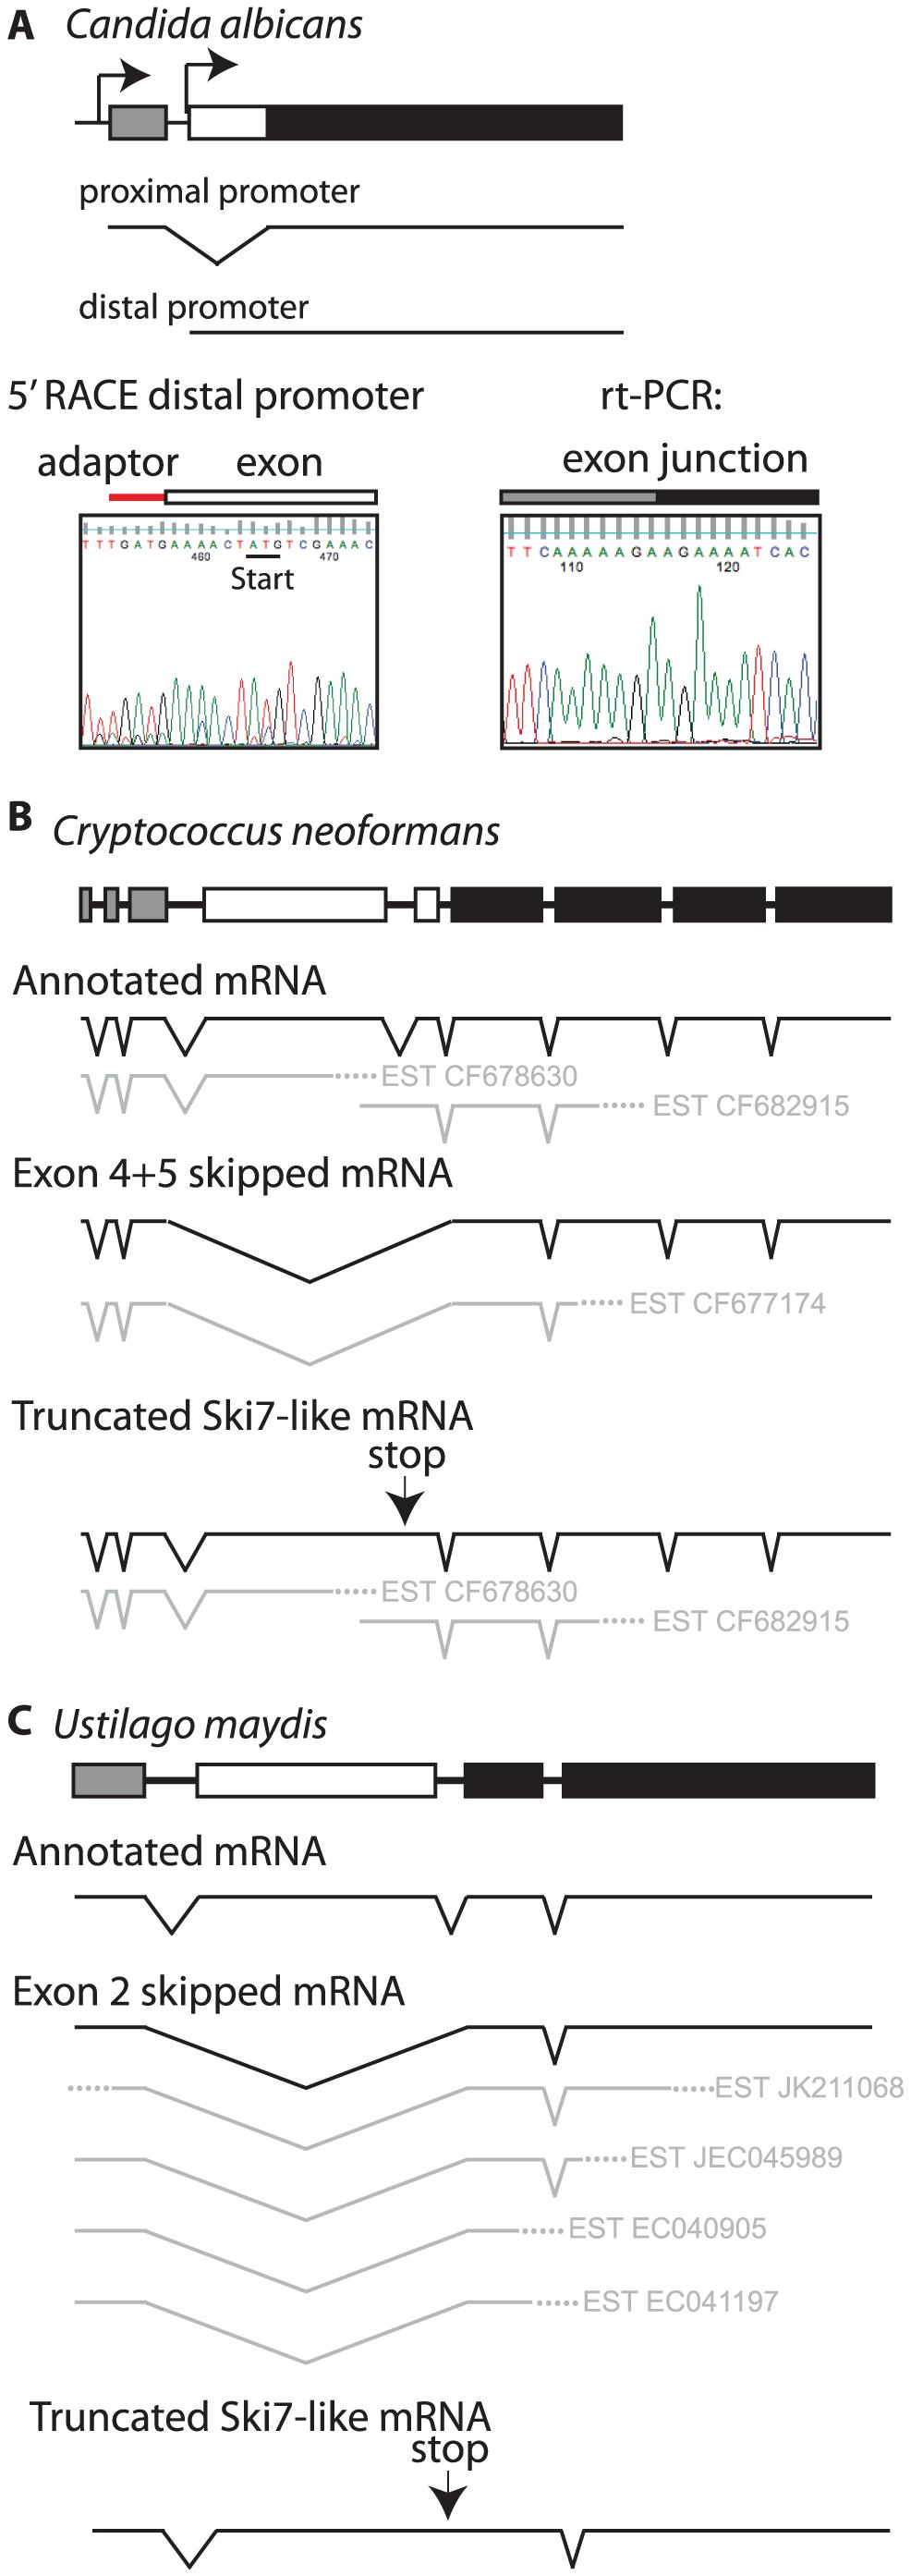 Some fungi use alternate methods to generate distinct <i>SKI7</i> and <i>HBS1</i> mRNAs from a single gene.